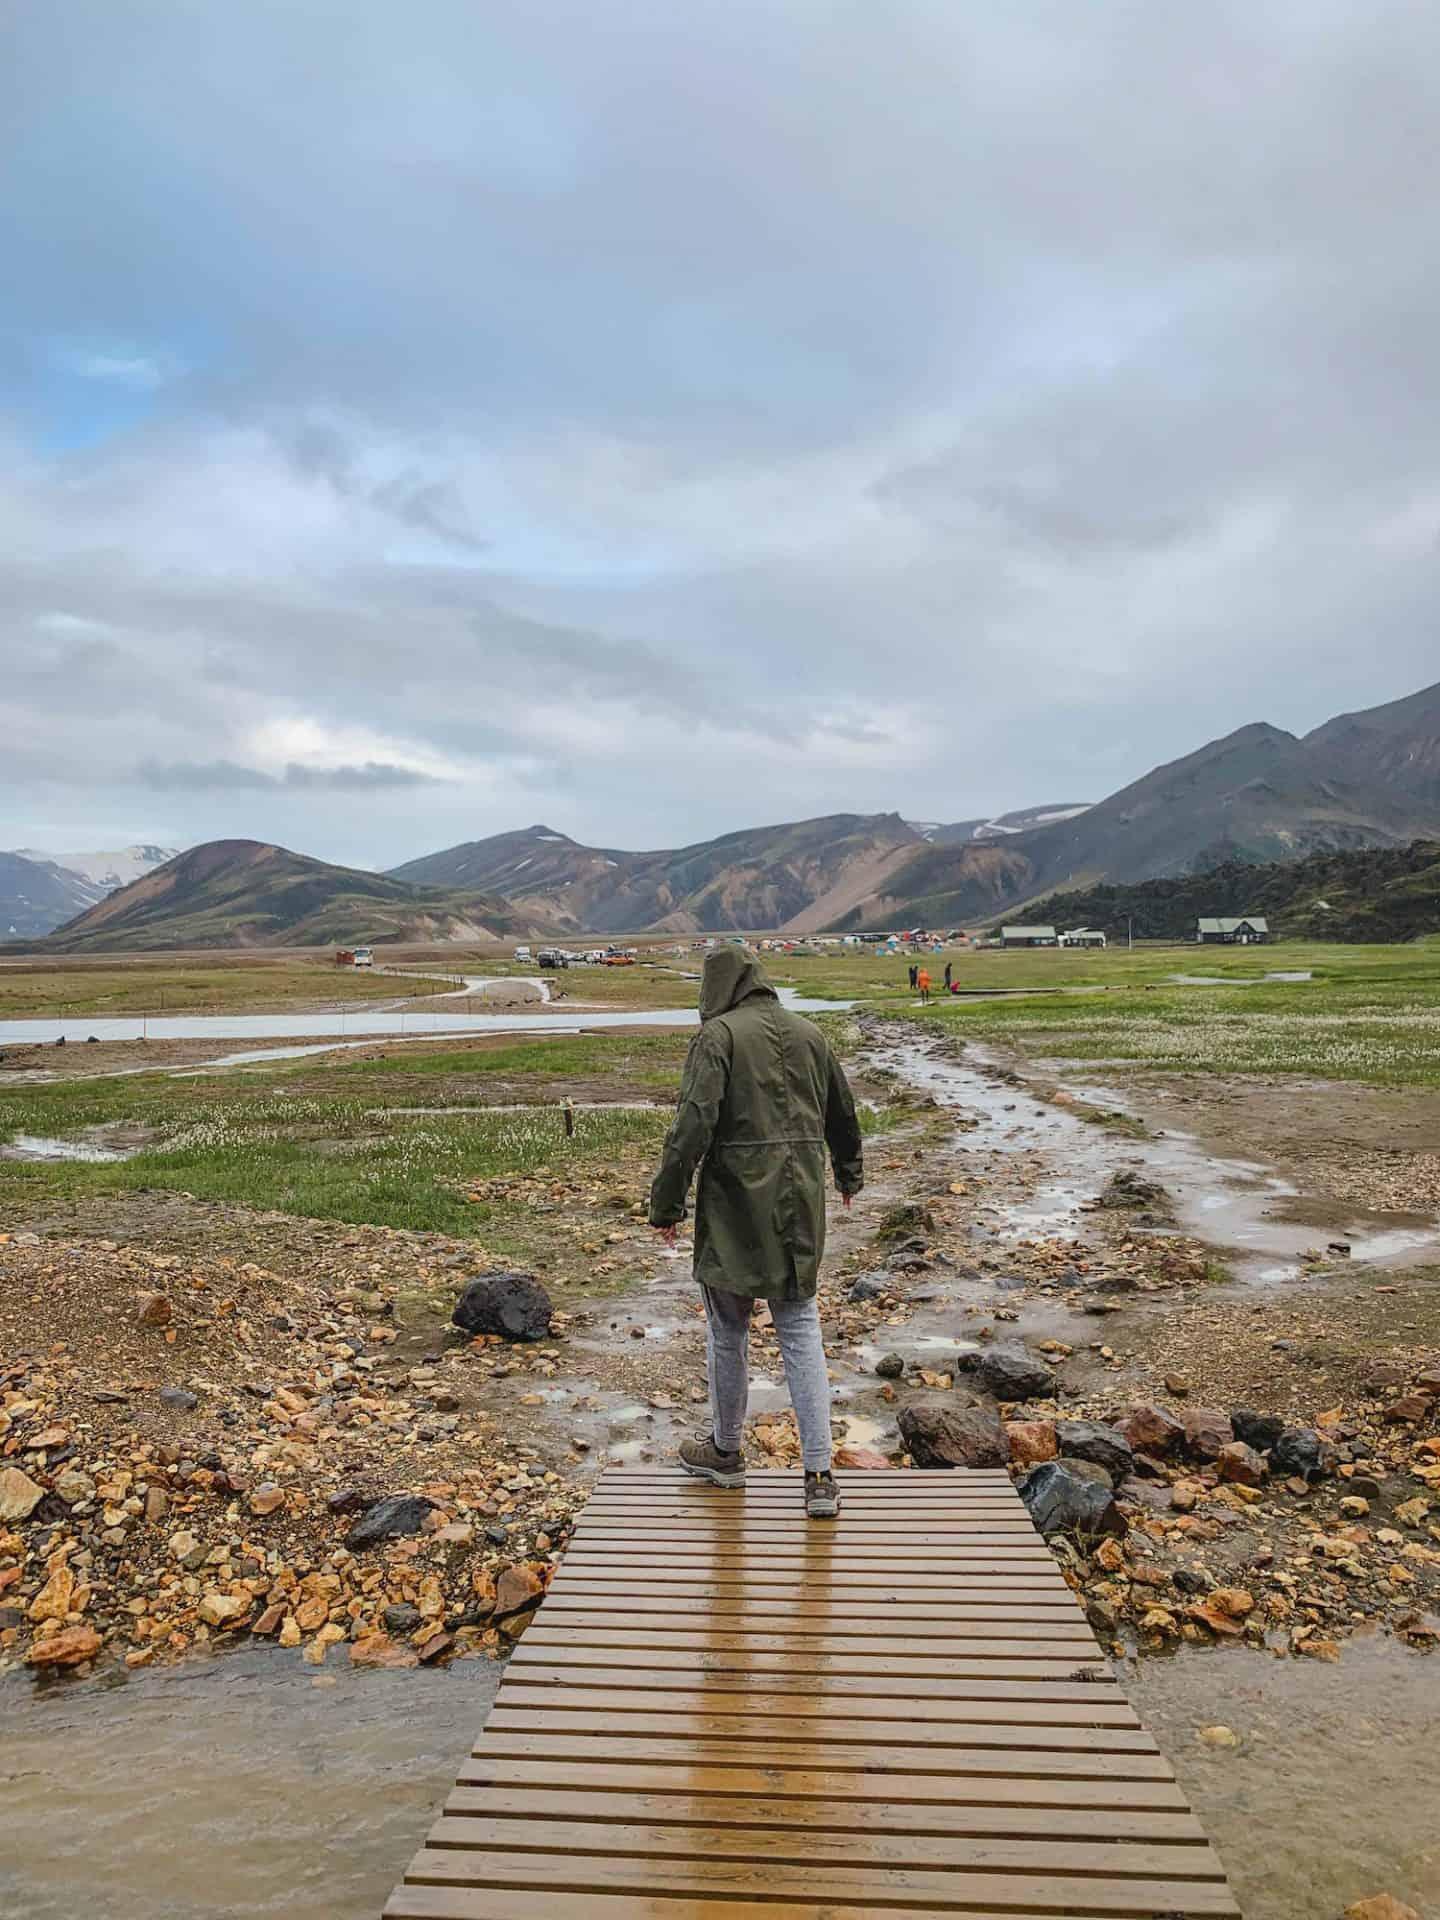 Landmannalaugar campsite in Icelandic Highlands